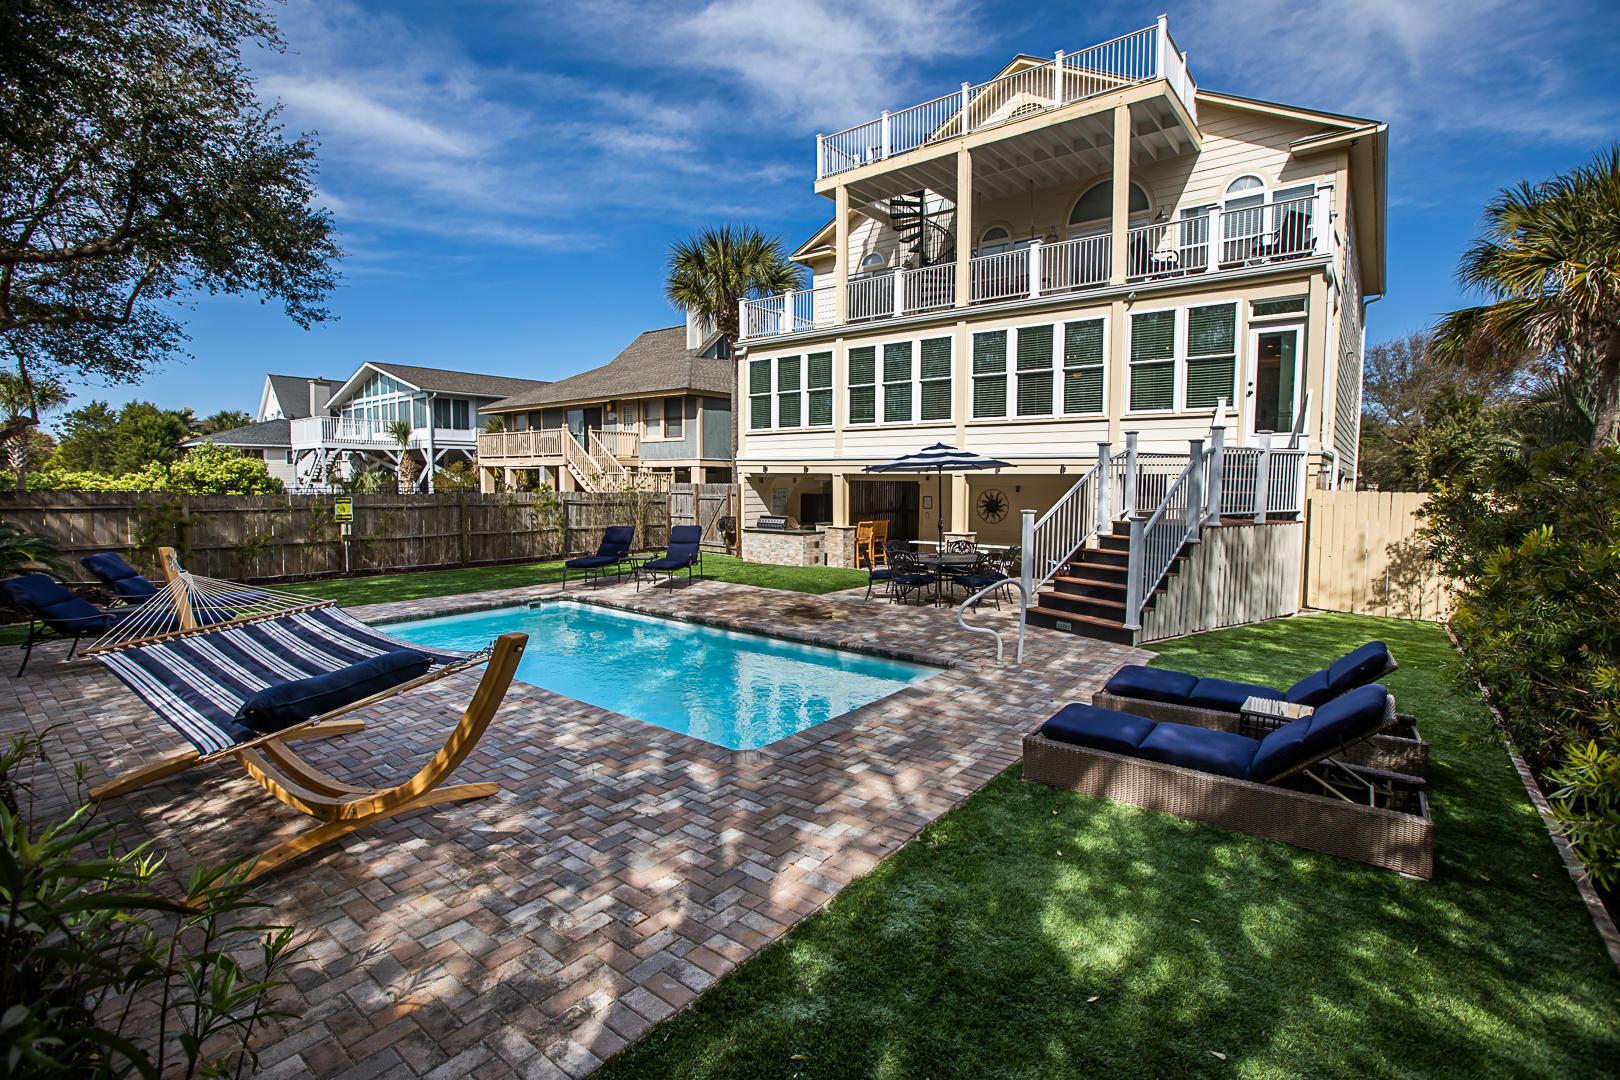 Isle of Palms Homes For Sale - 712 Carolina, Isle of Palms, SC - 40